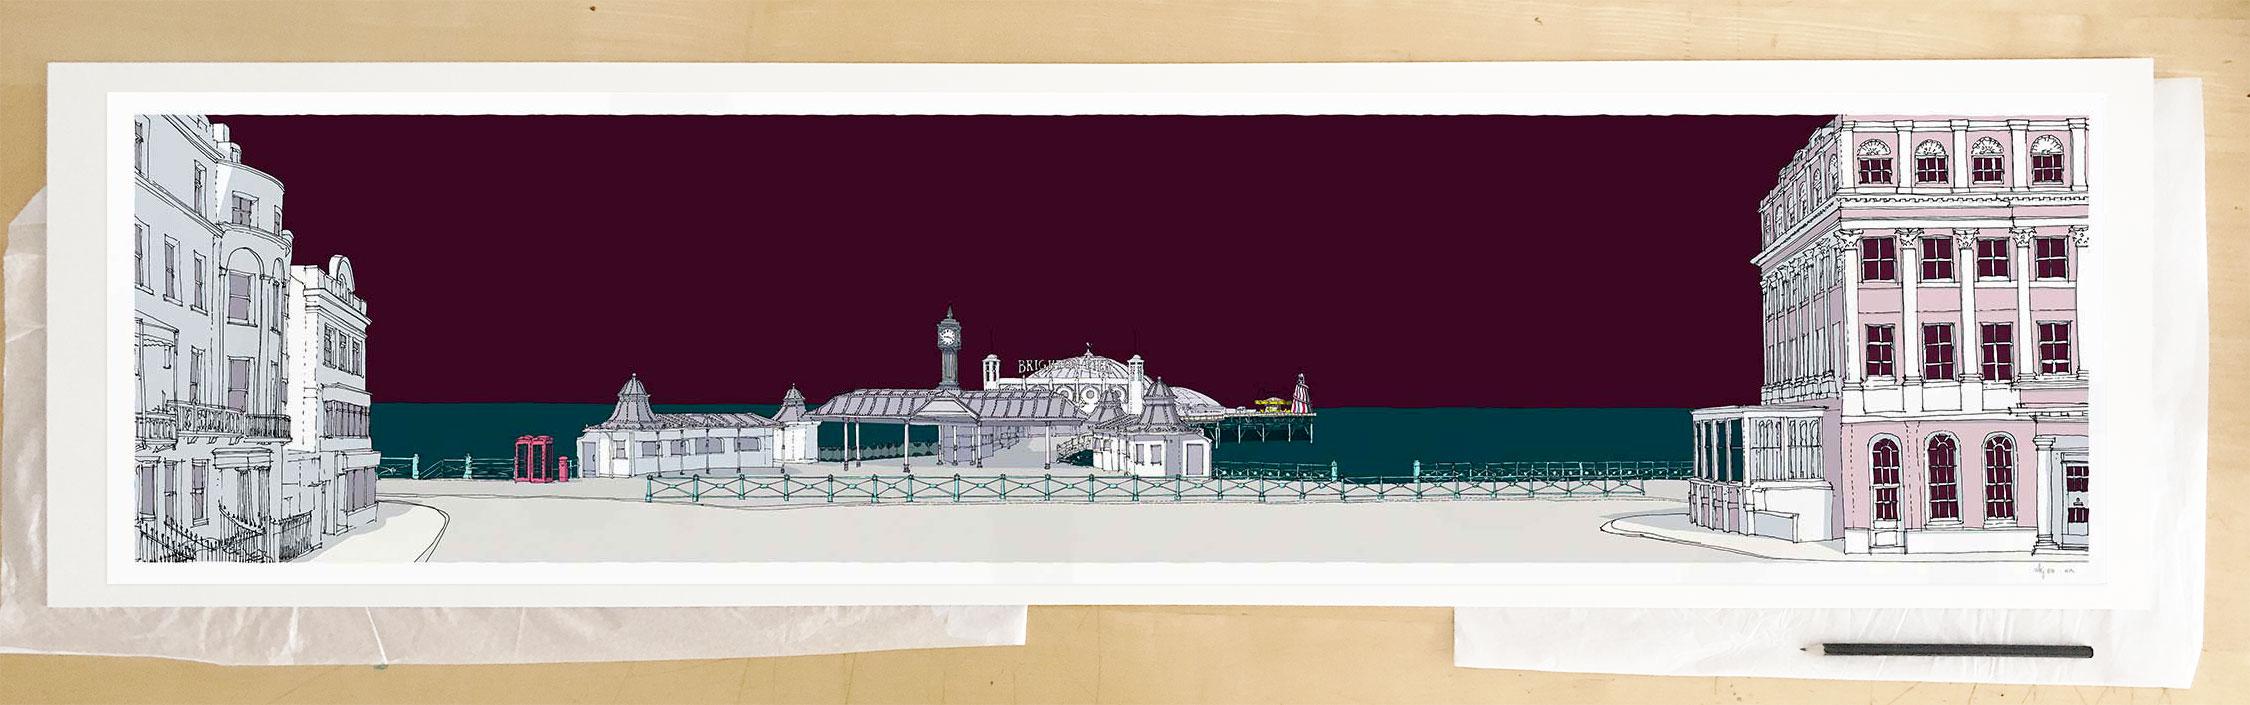 Fine art print by UK artist alej ez titled Brighton City Pier Mauve Sky